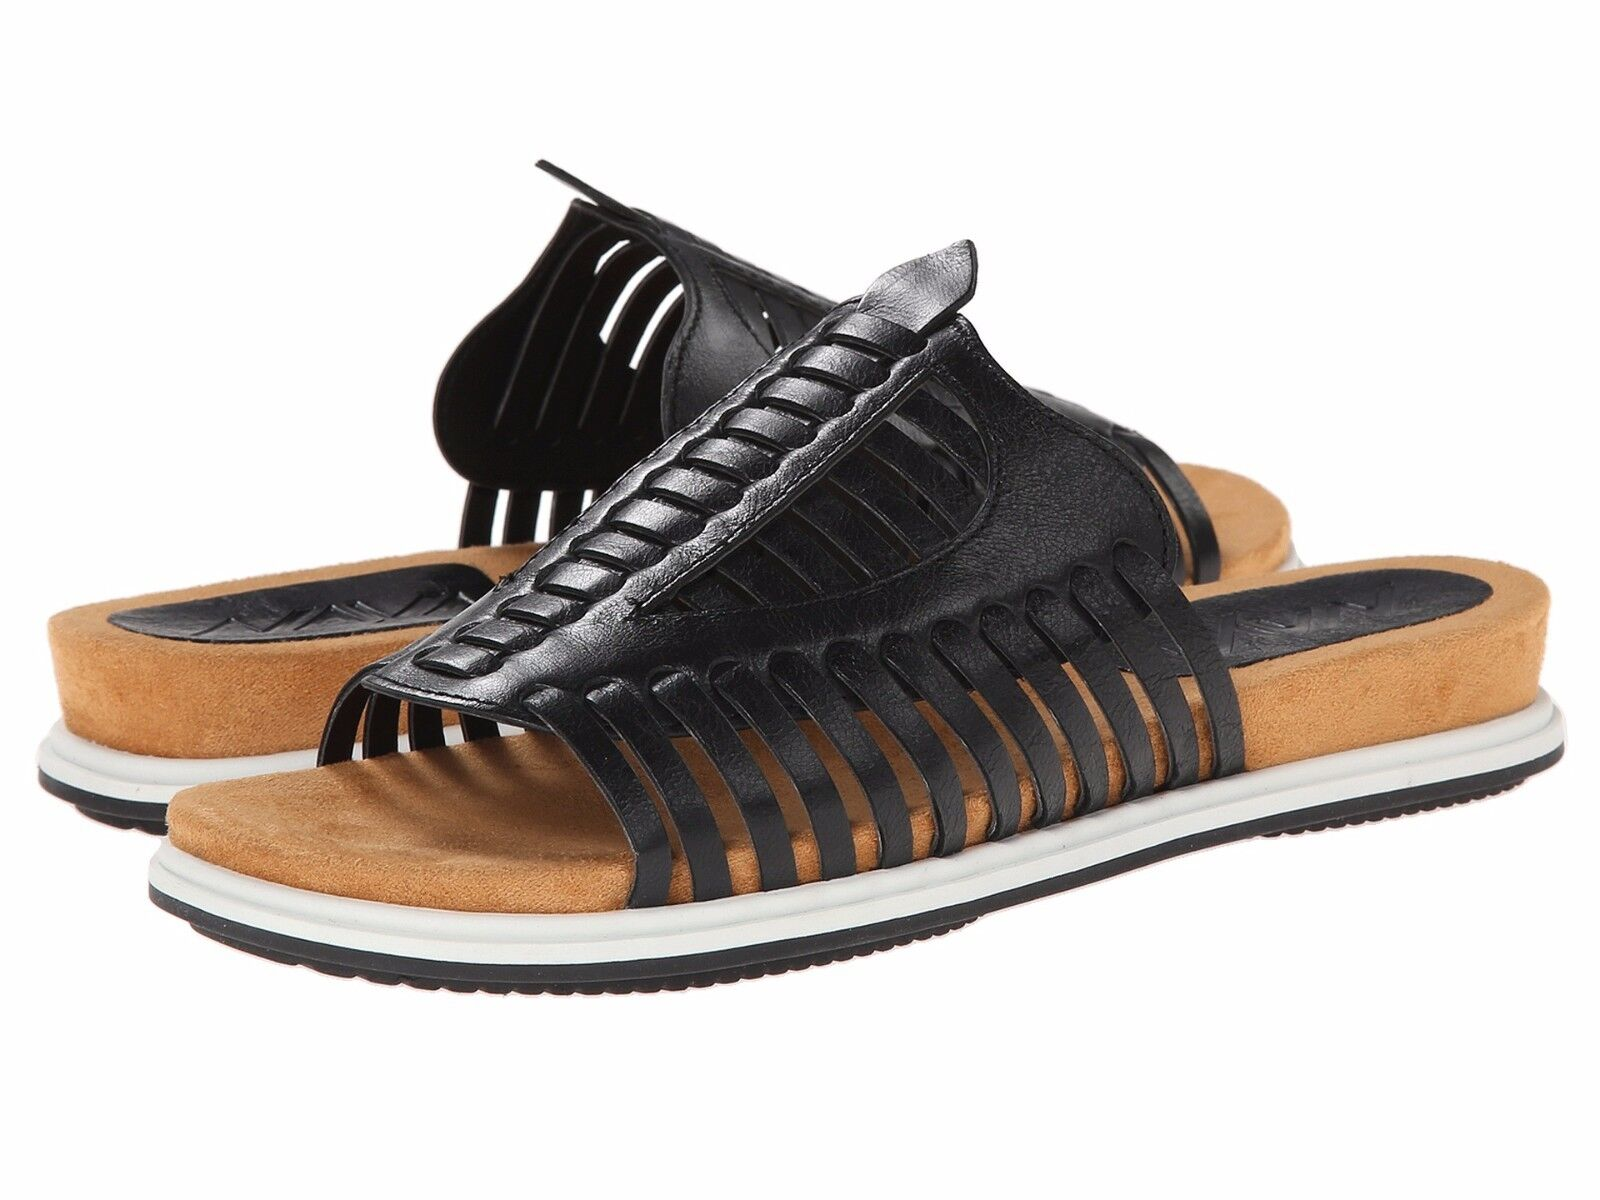 Nuevo Naya Kicker Negro Para Para Para Mujer Zapatos Talla 8.5  Tienda 2018